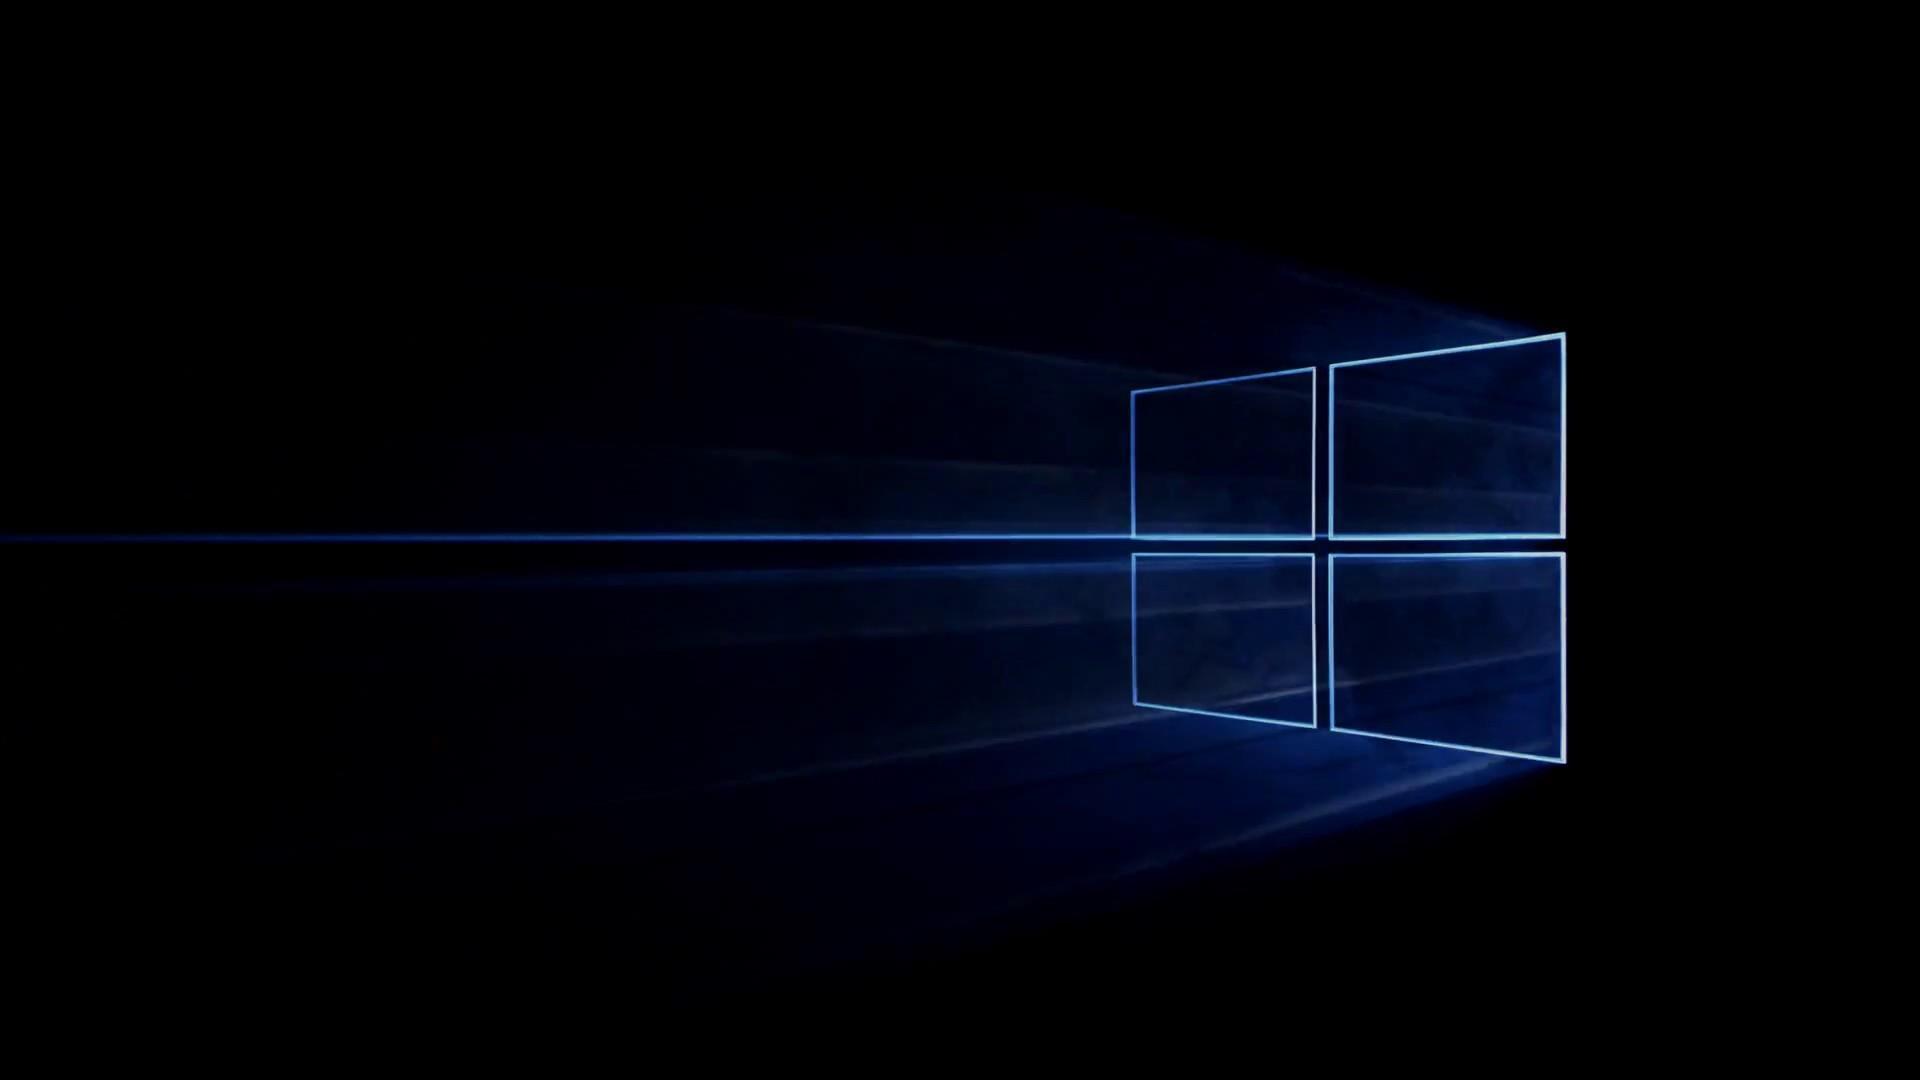 Amazing Wallpapers For Desktop Hd Free Download Windows 10 Black Wallpaper 67 Images